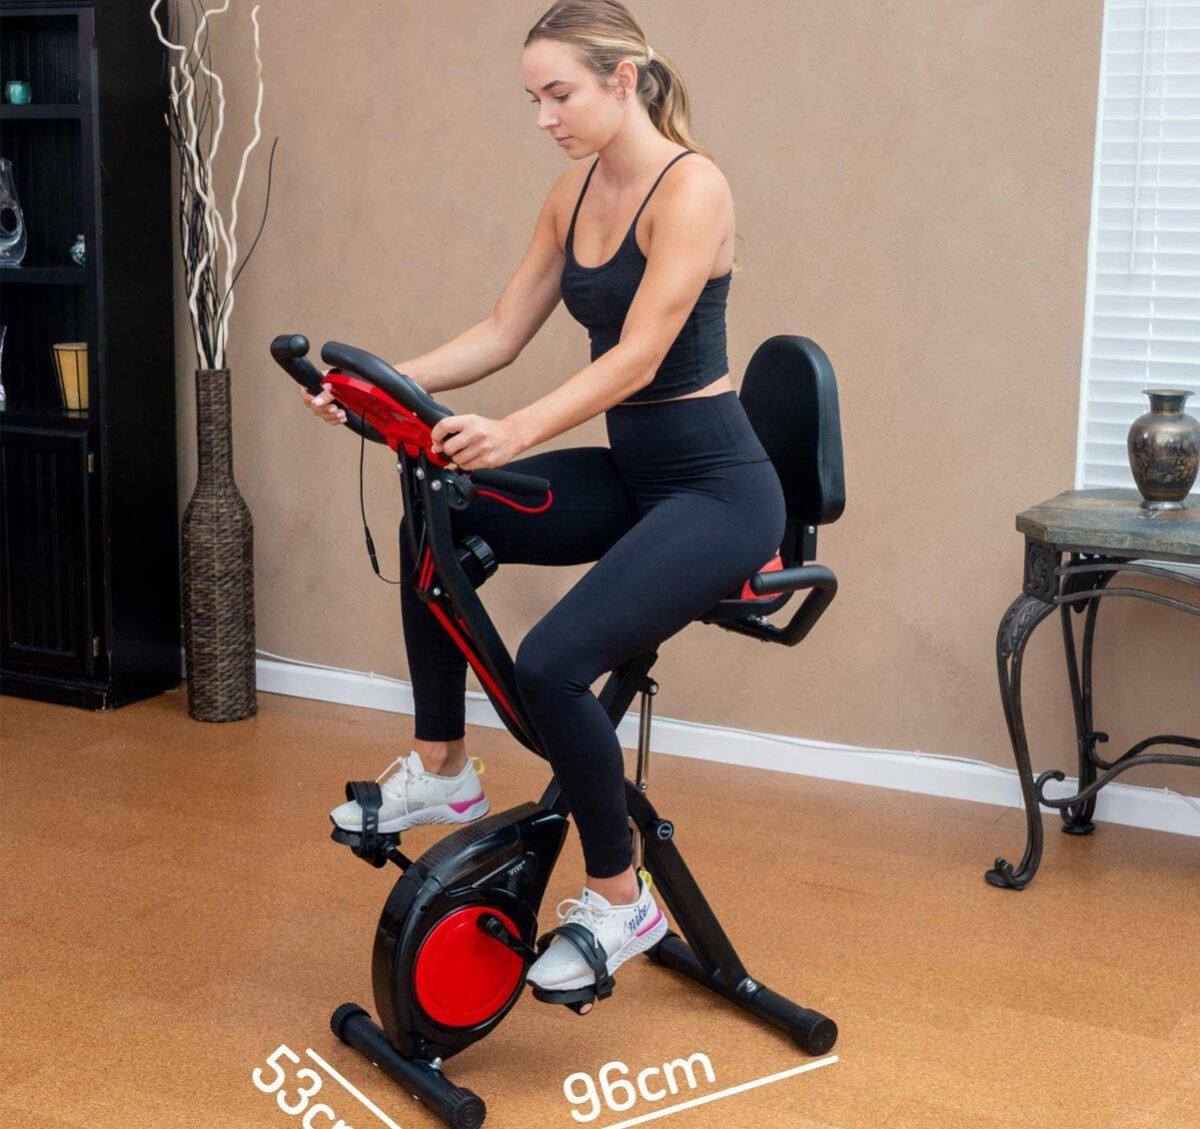 YYFITT 2 in 1 Foldable Fitness Exercise Bike women cycling comparison